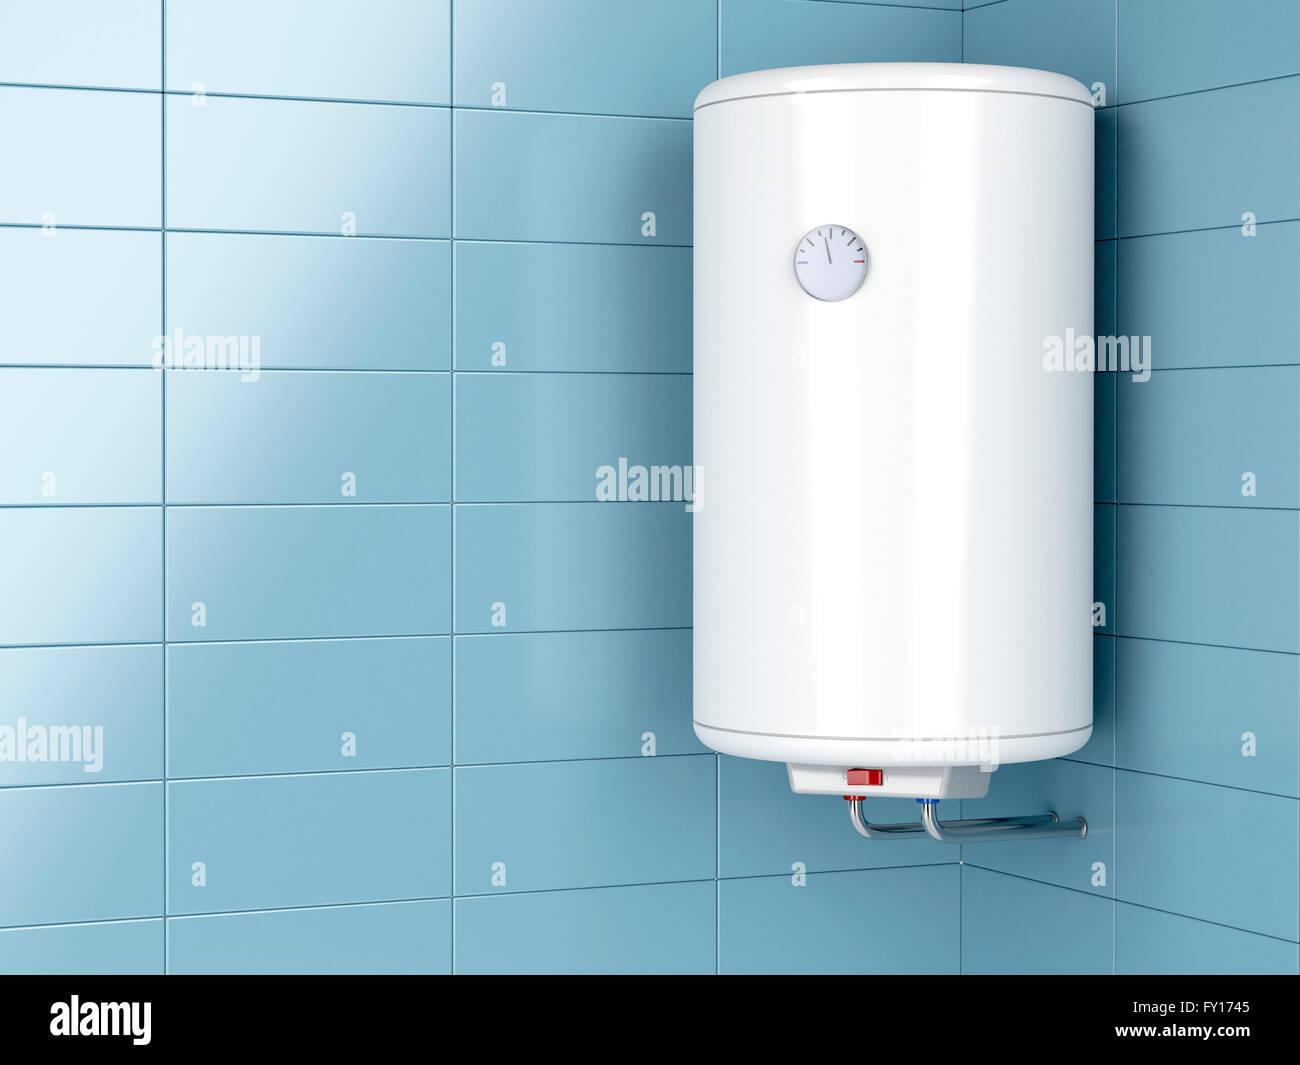 Metal Water Heater Stock Photos & Metal Water Heater Stock Images ...